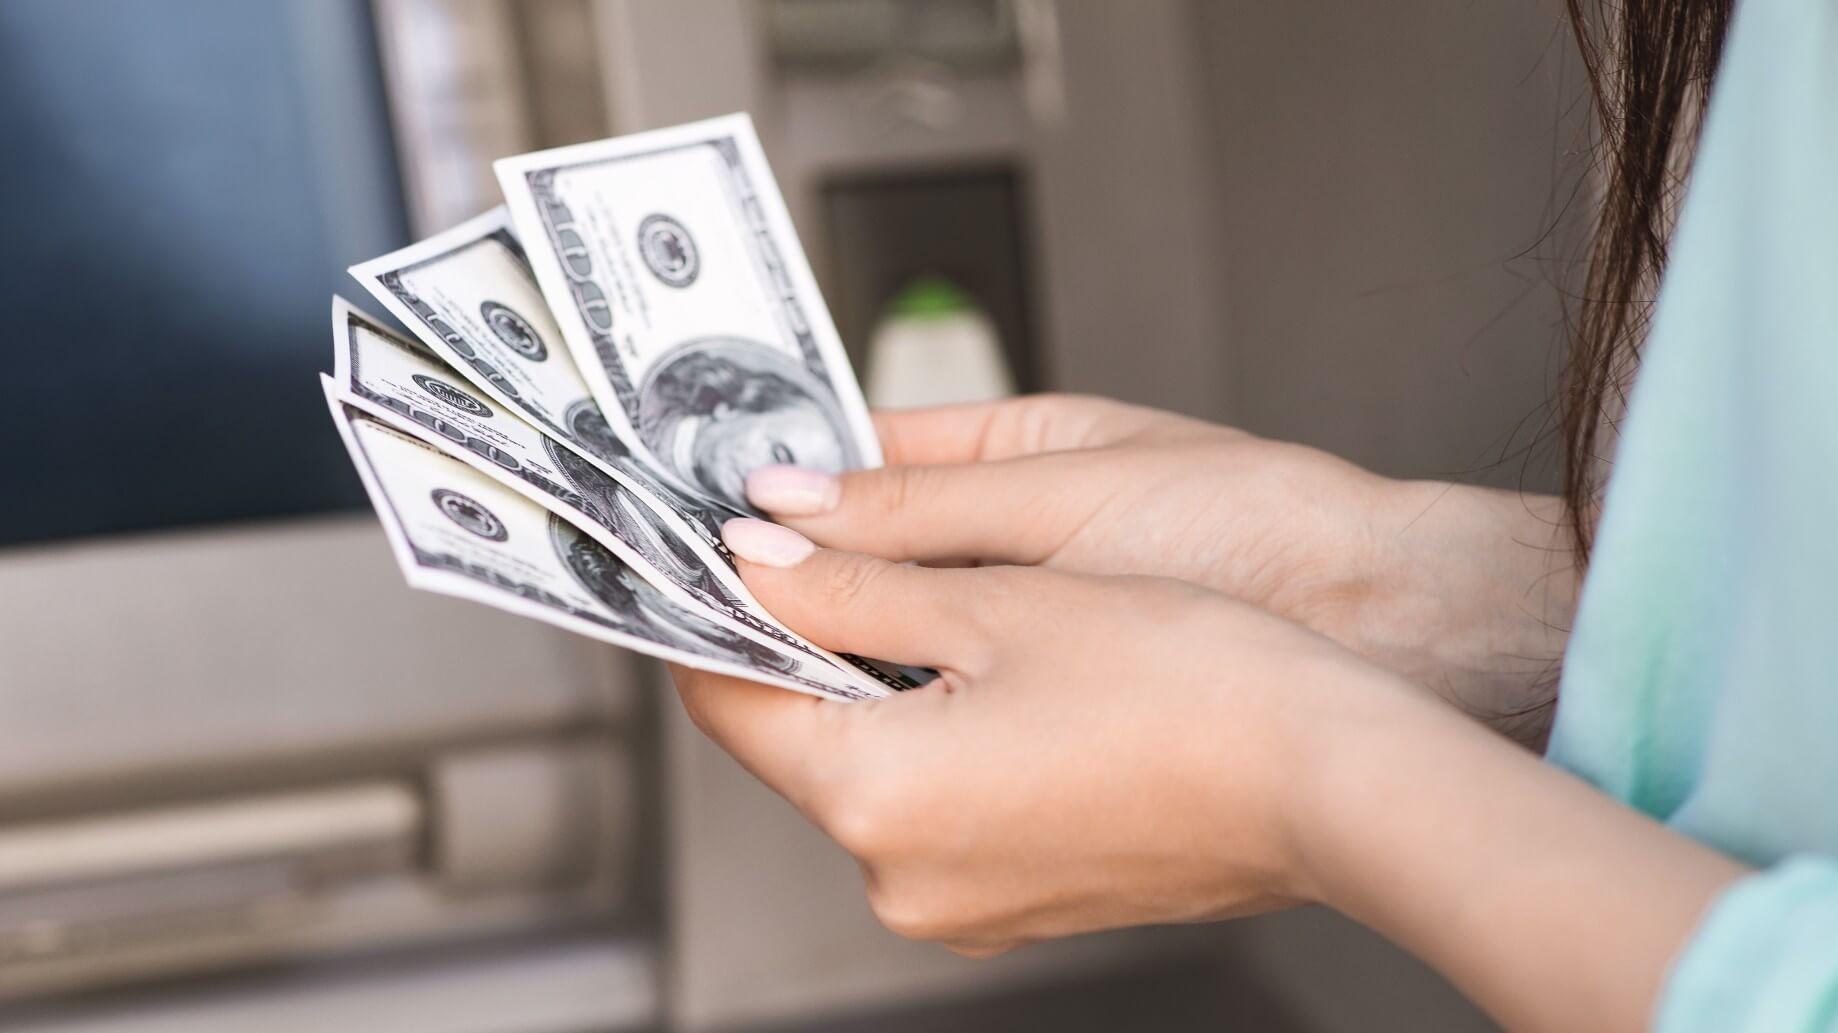 Do bitcoin ATMs give cash